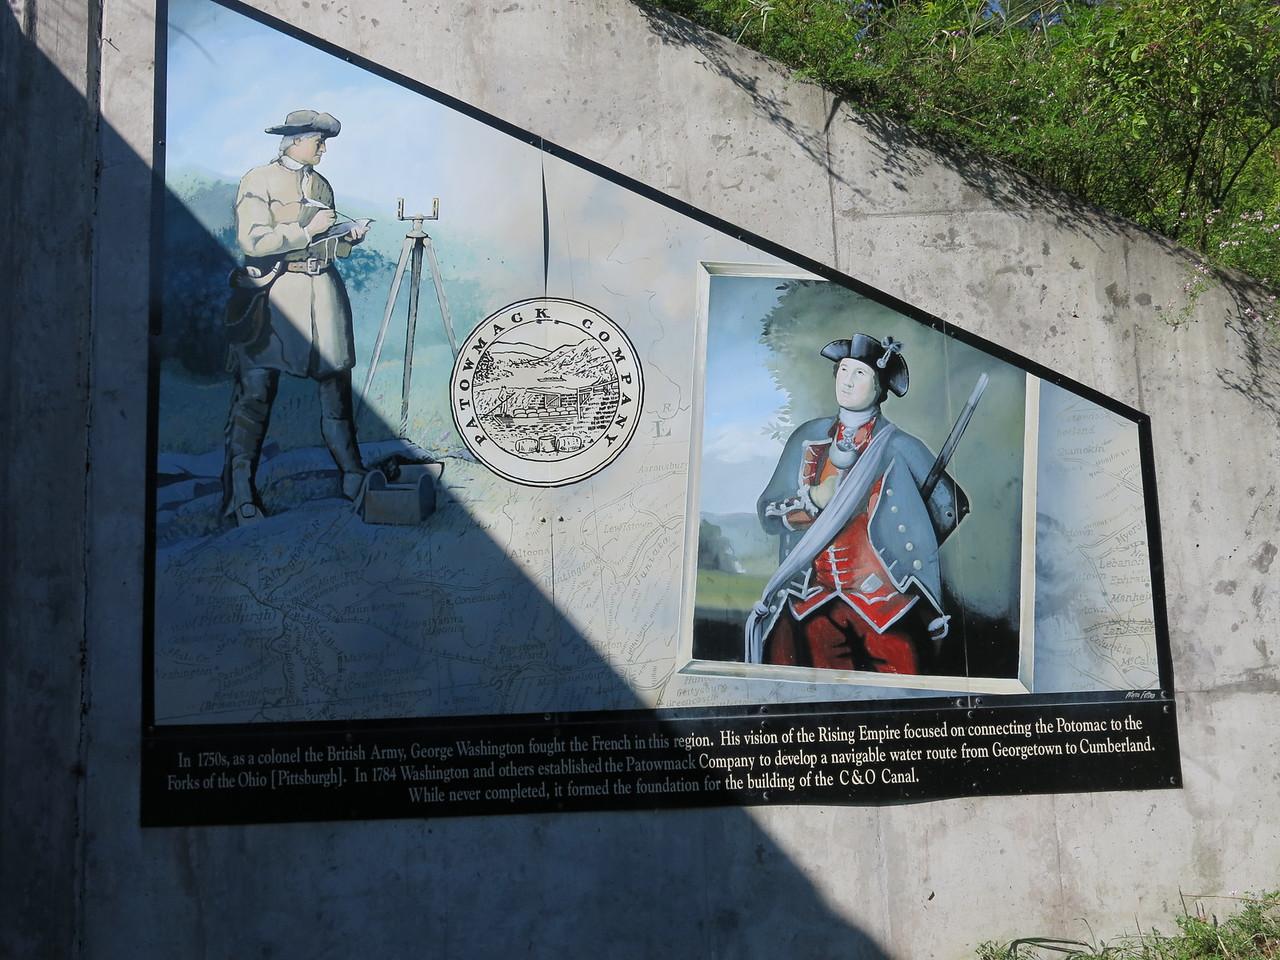 George Washington and the Patomack Company